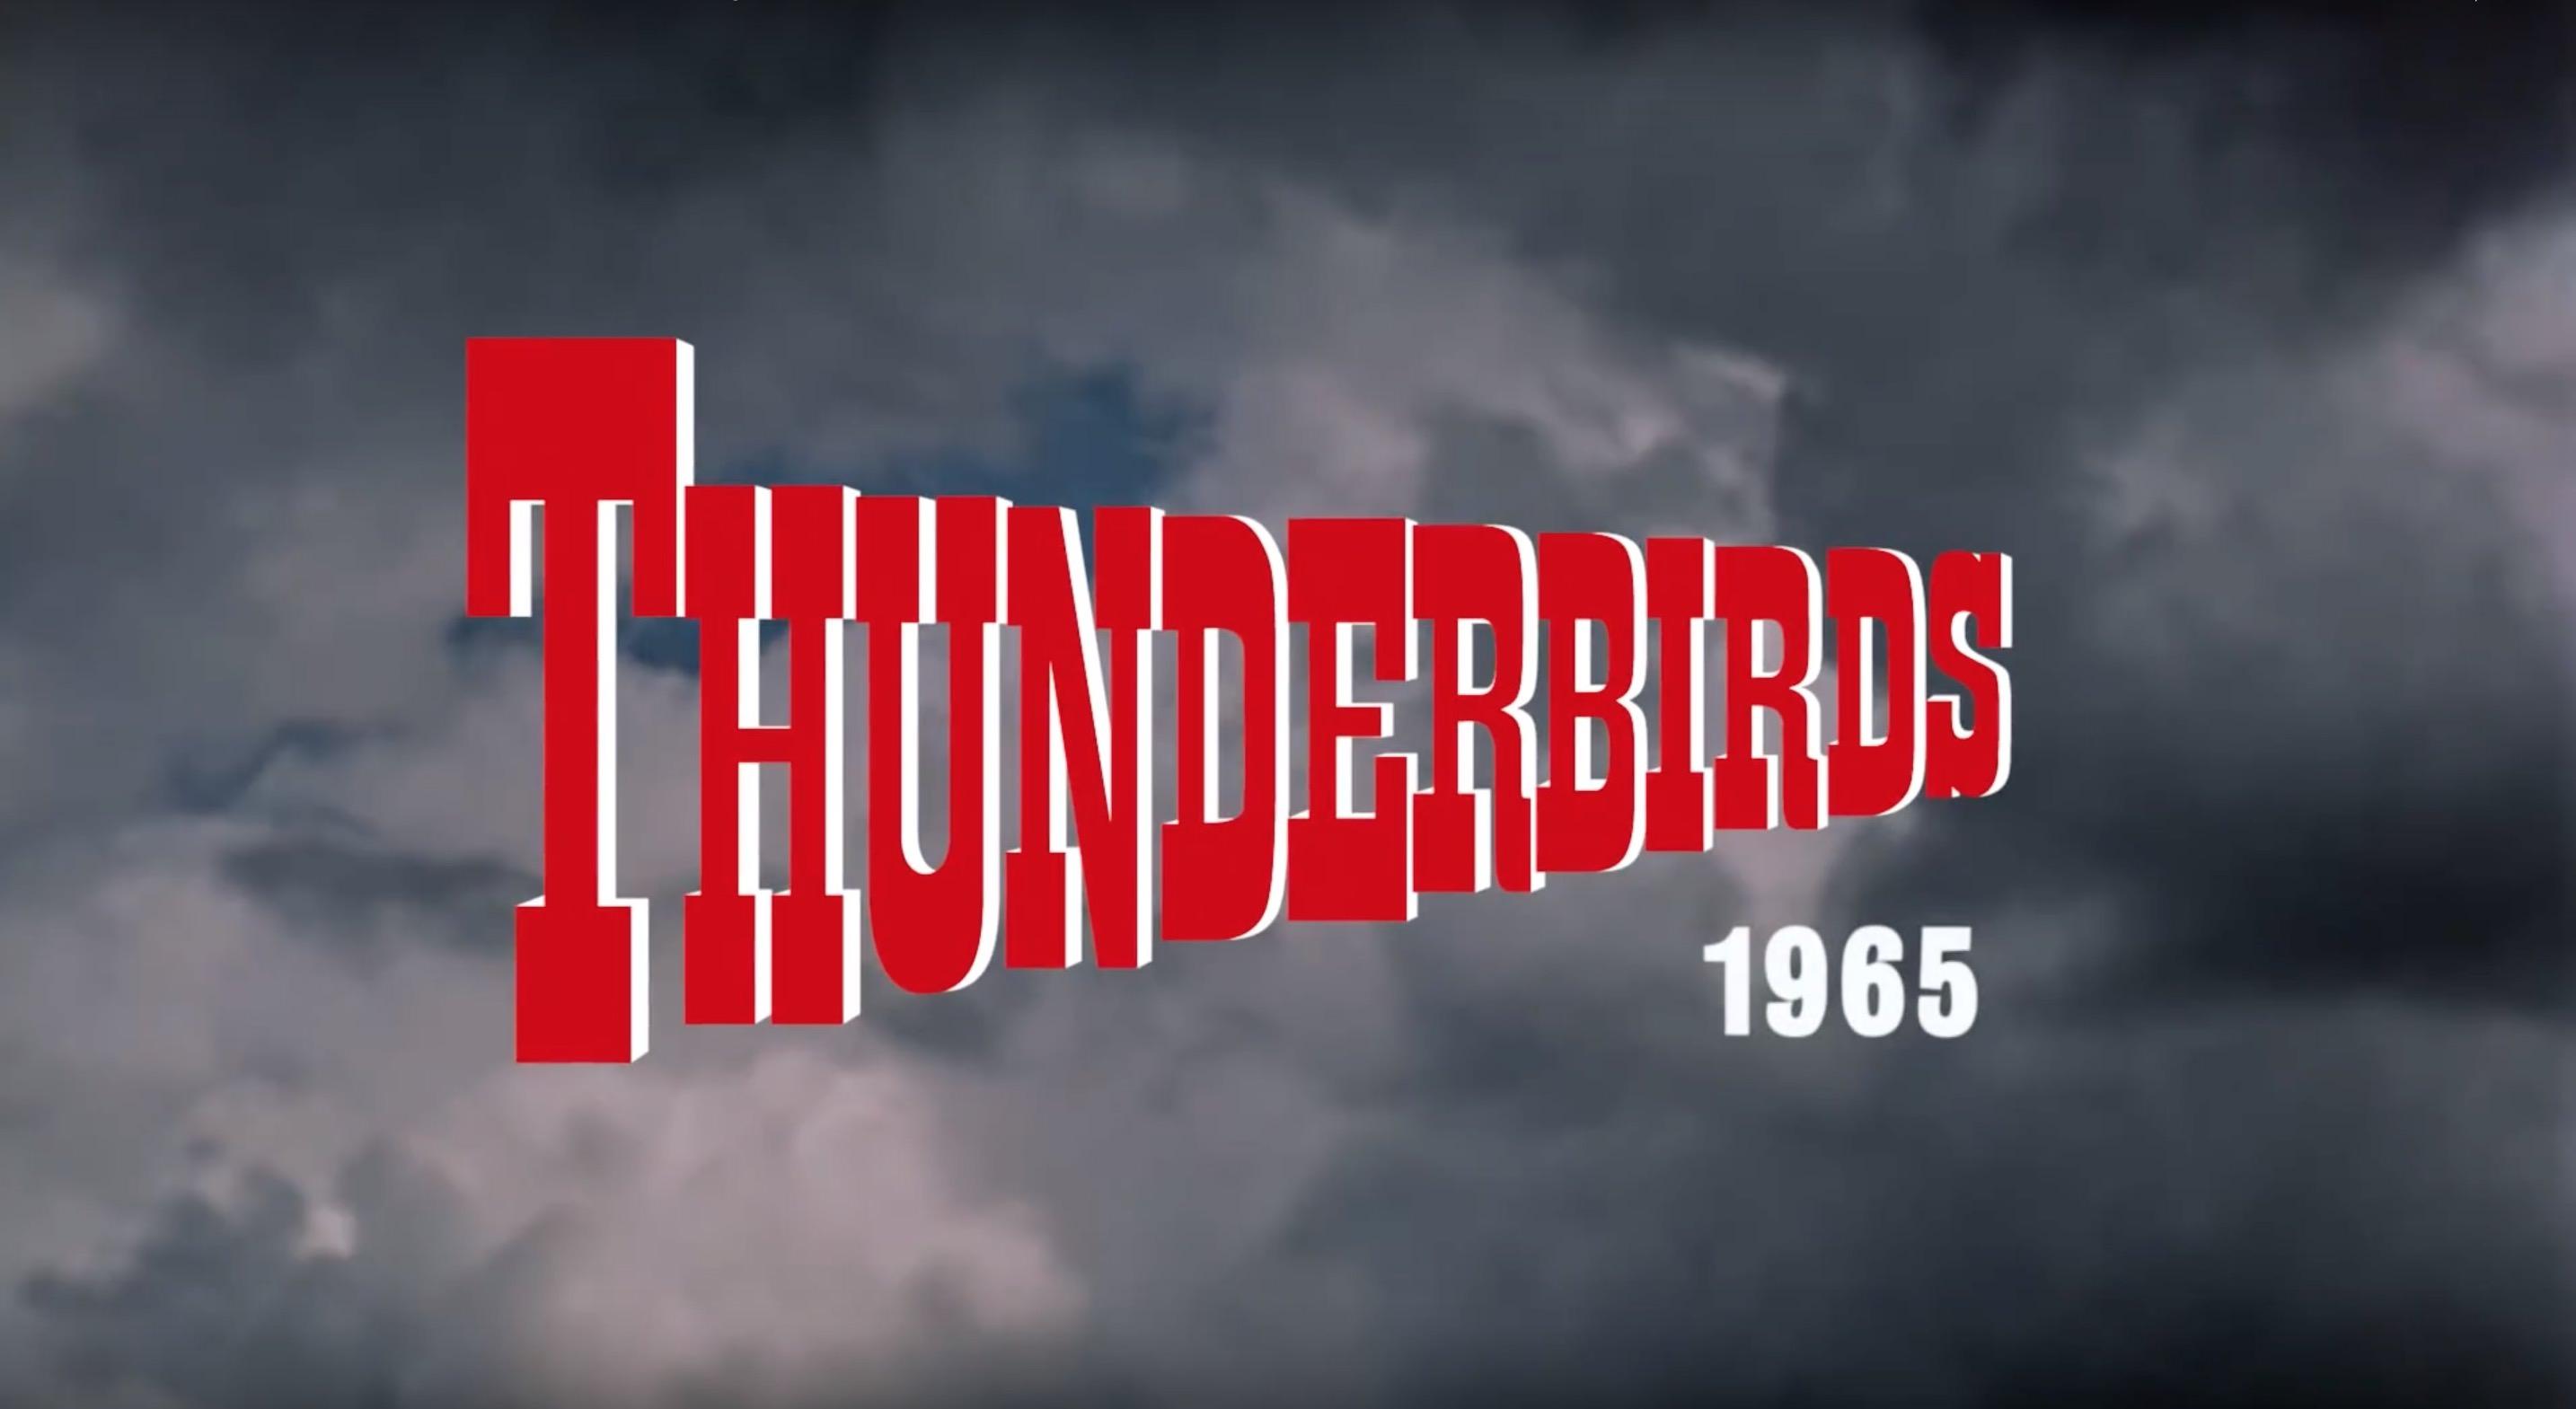 Thunderbirds 1965